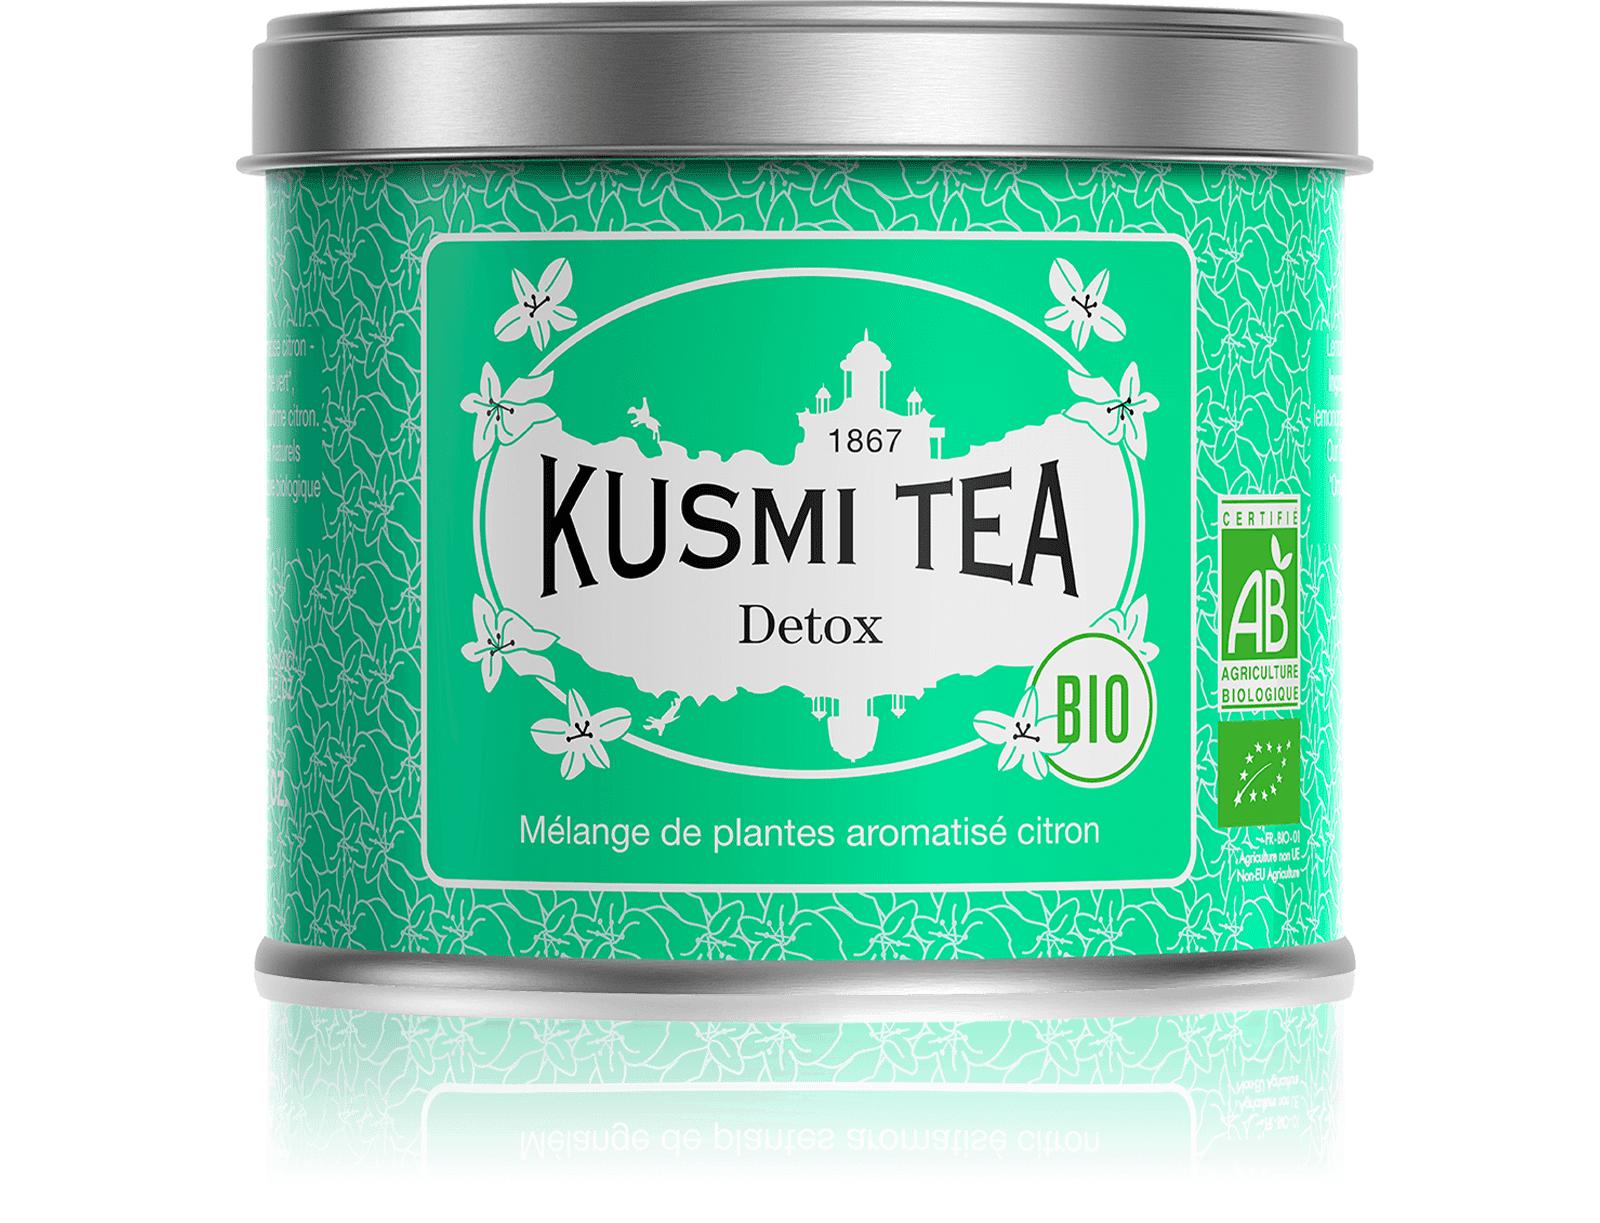 KUSMI TEA Detox bio - Thé vert, maté, citron - Boîte de thé en vrac - Kusmi Tea